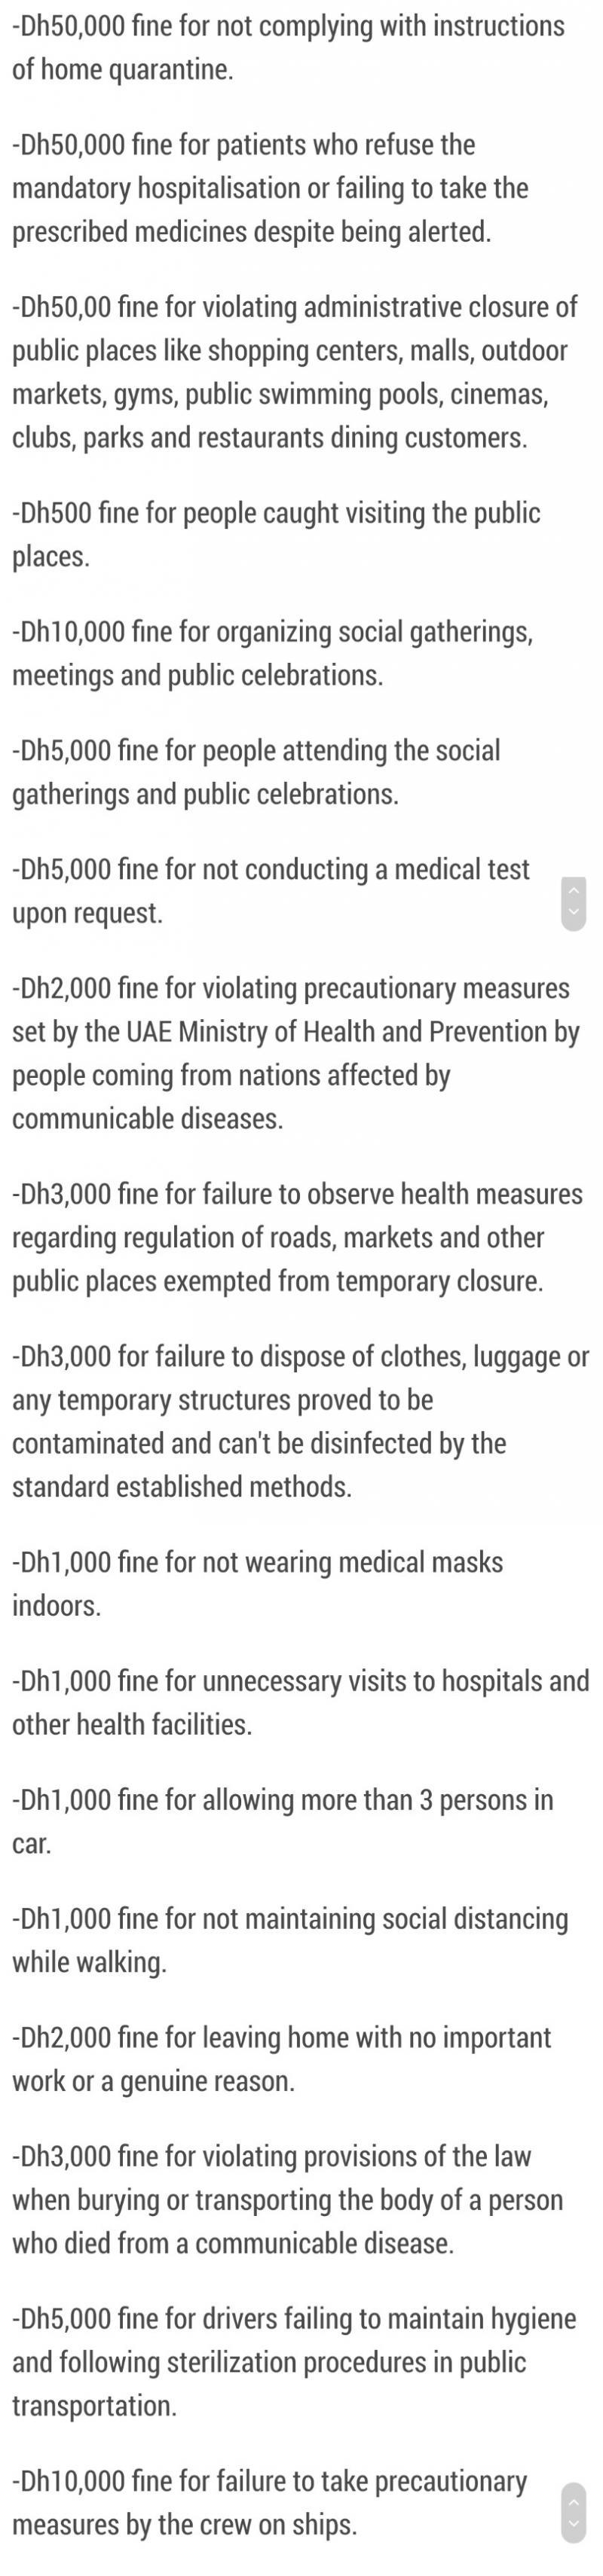 List of Fines in #UAE for Violating #Corona precautions